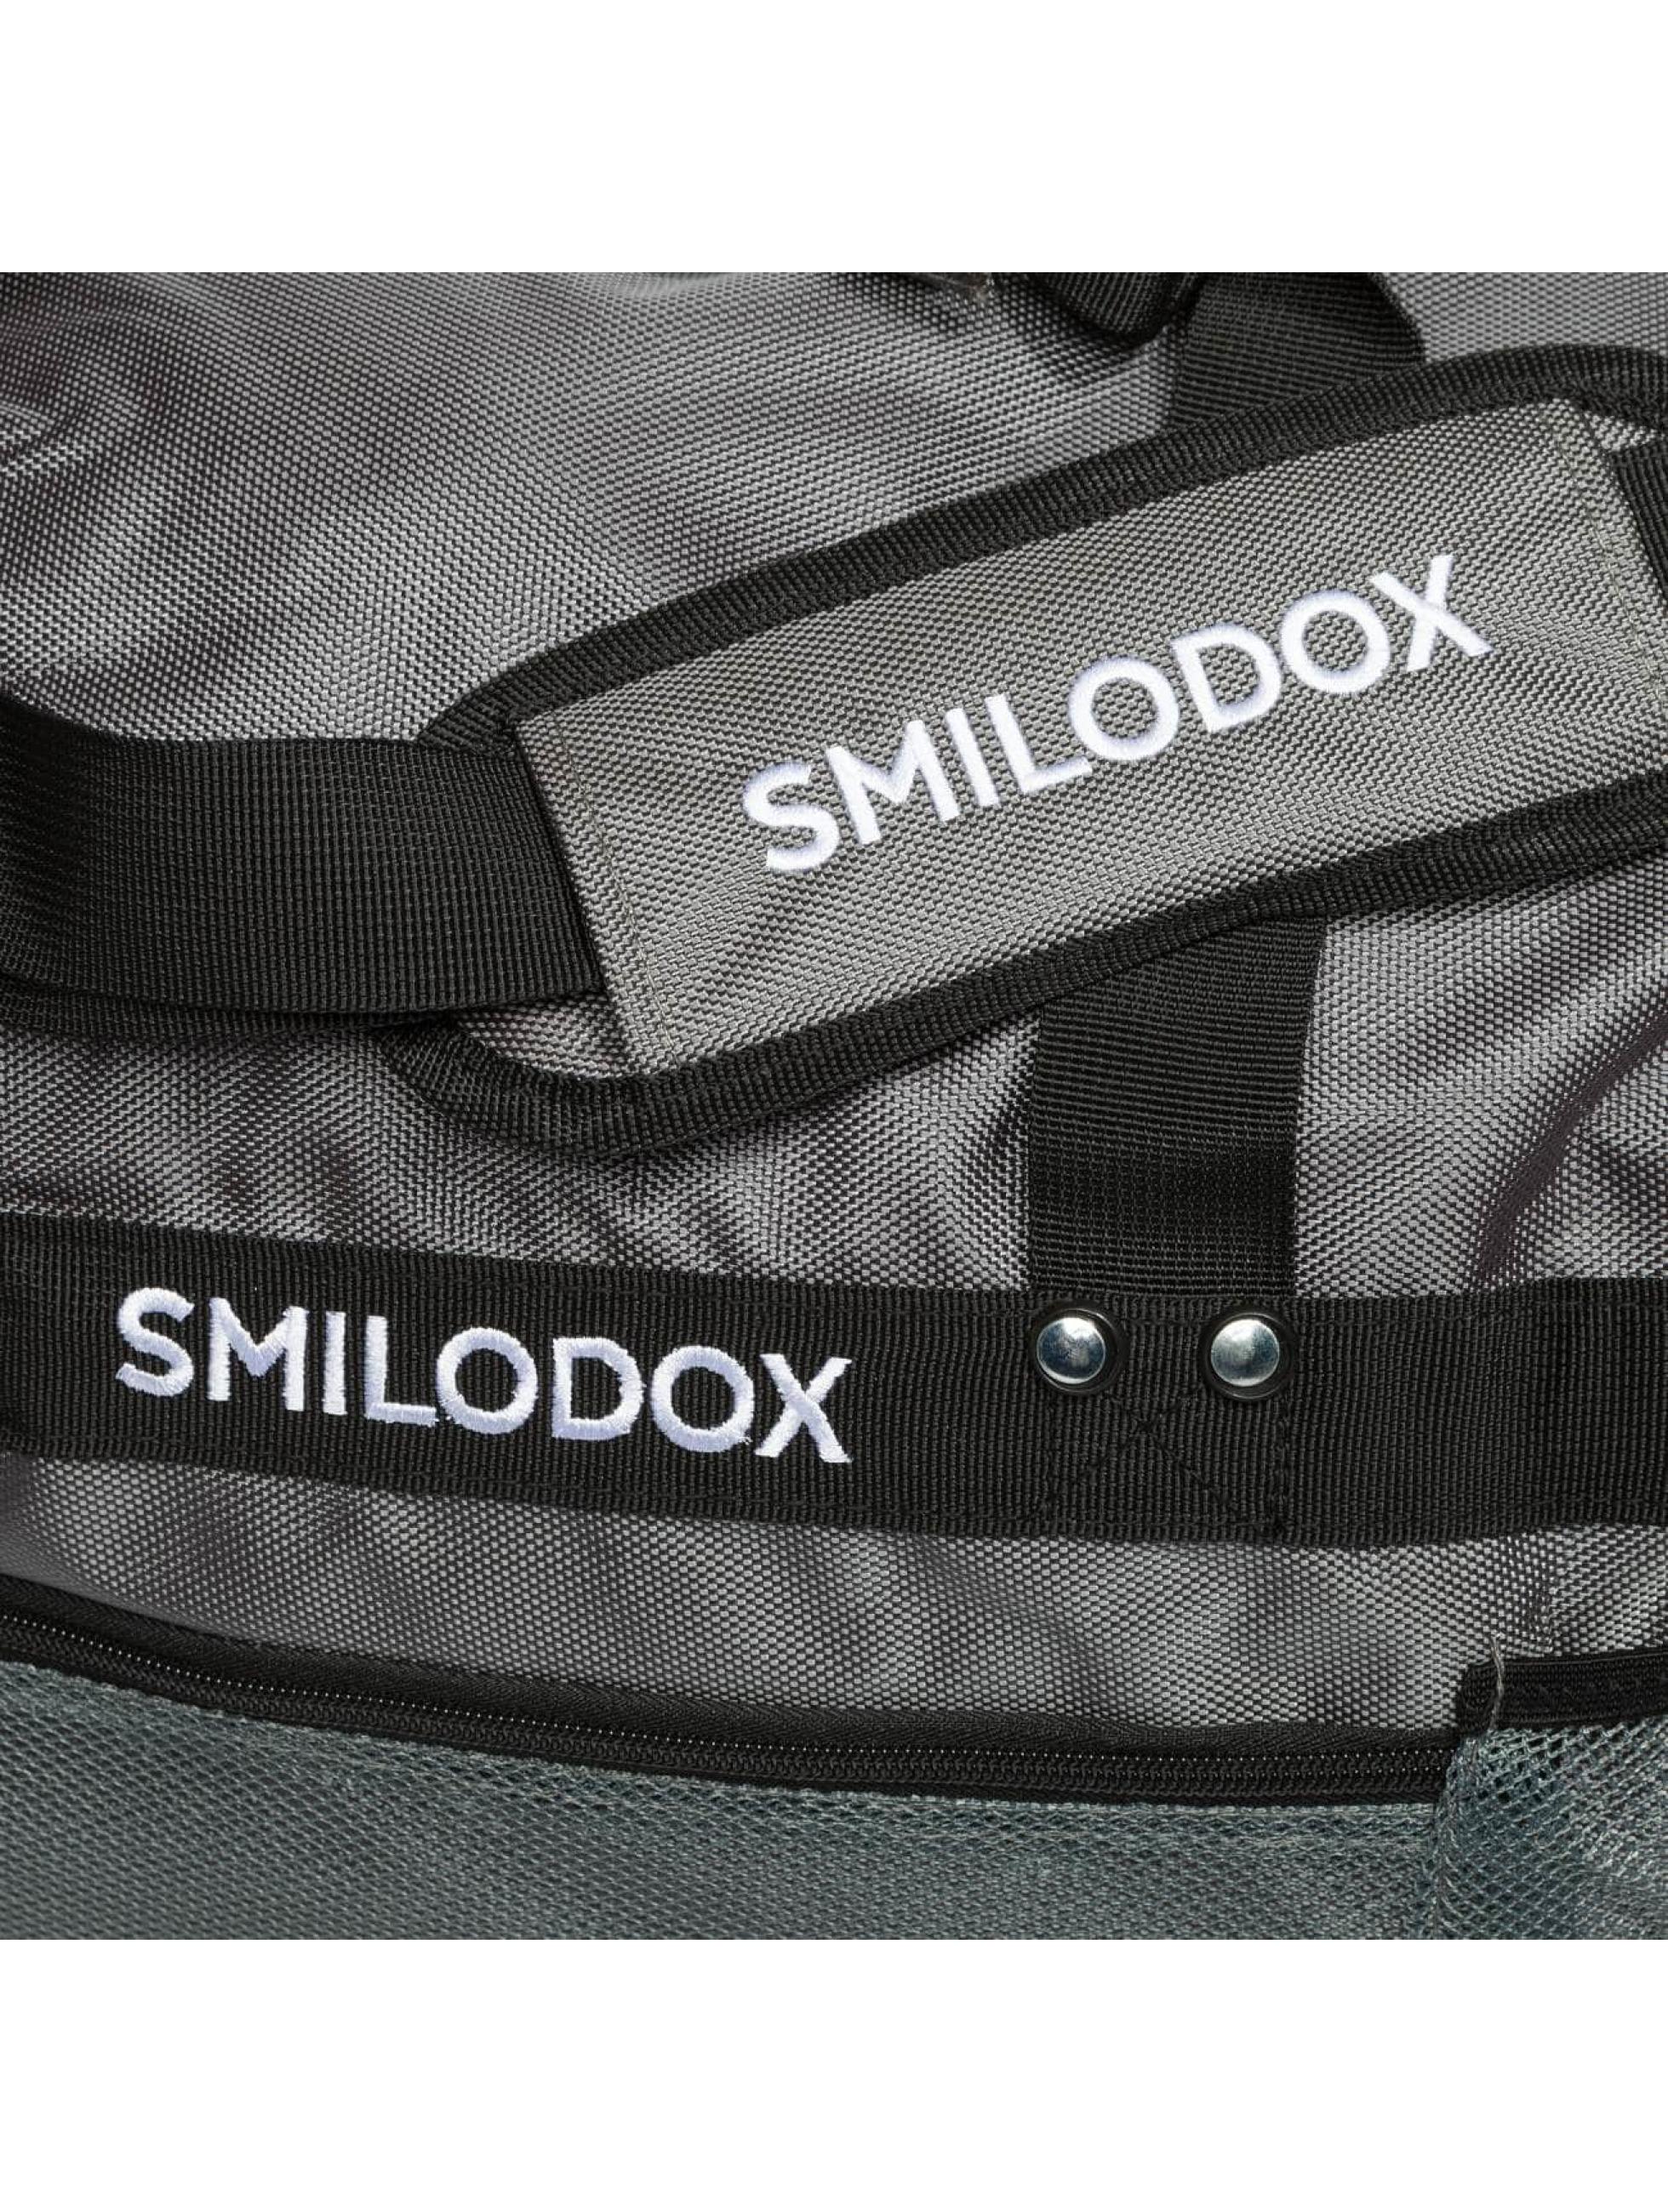 Smilodox Sac Sport gris